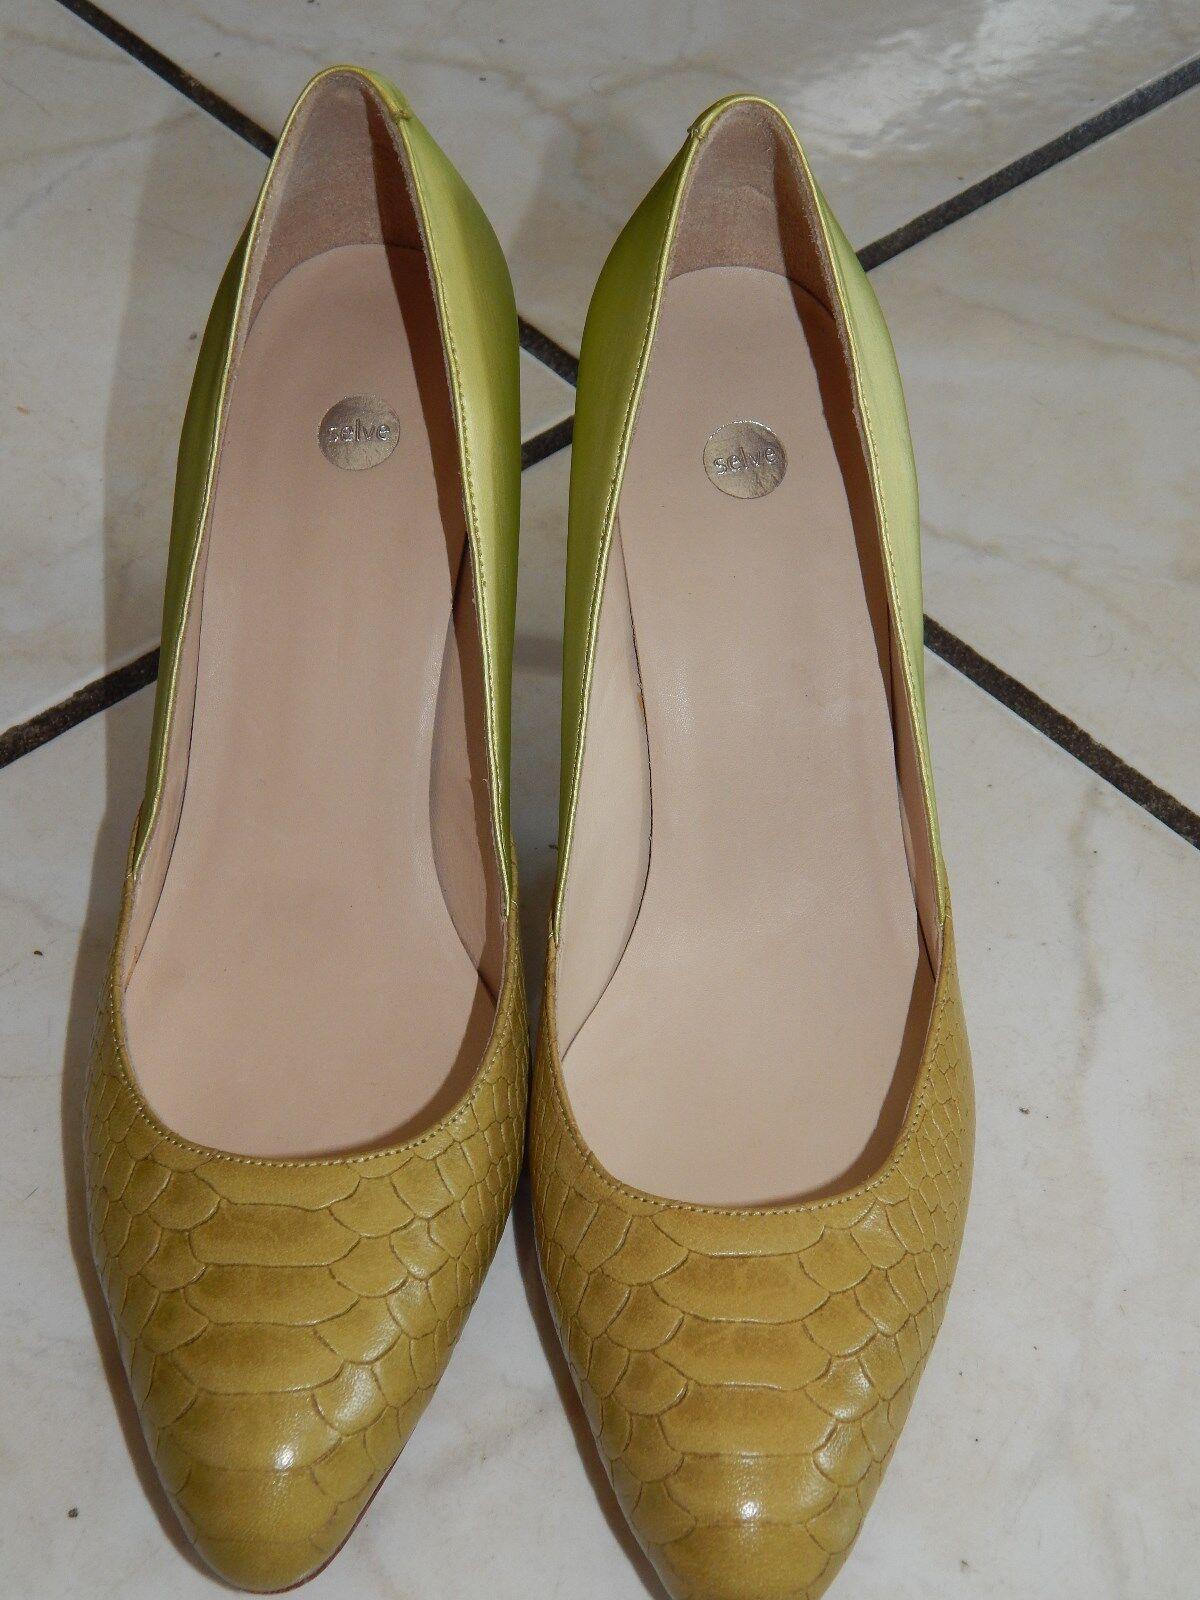 SELVE Loafers Mokassins Halbschuhe Ballerinas Handmade Gr. 38,5   Echt Leder (7)